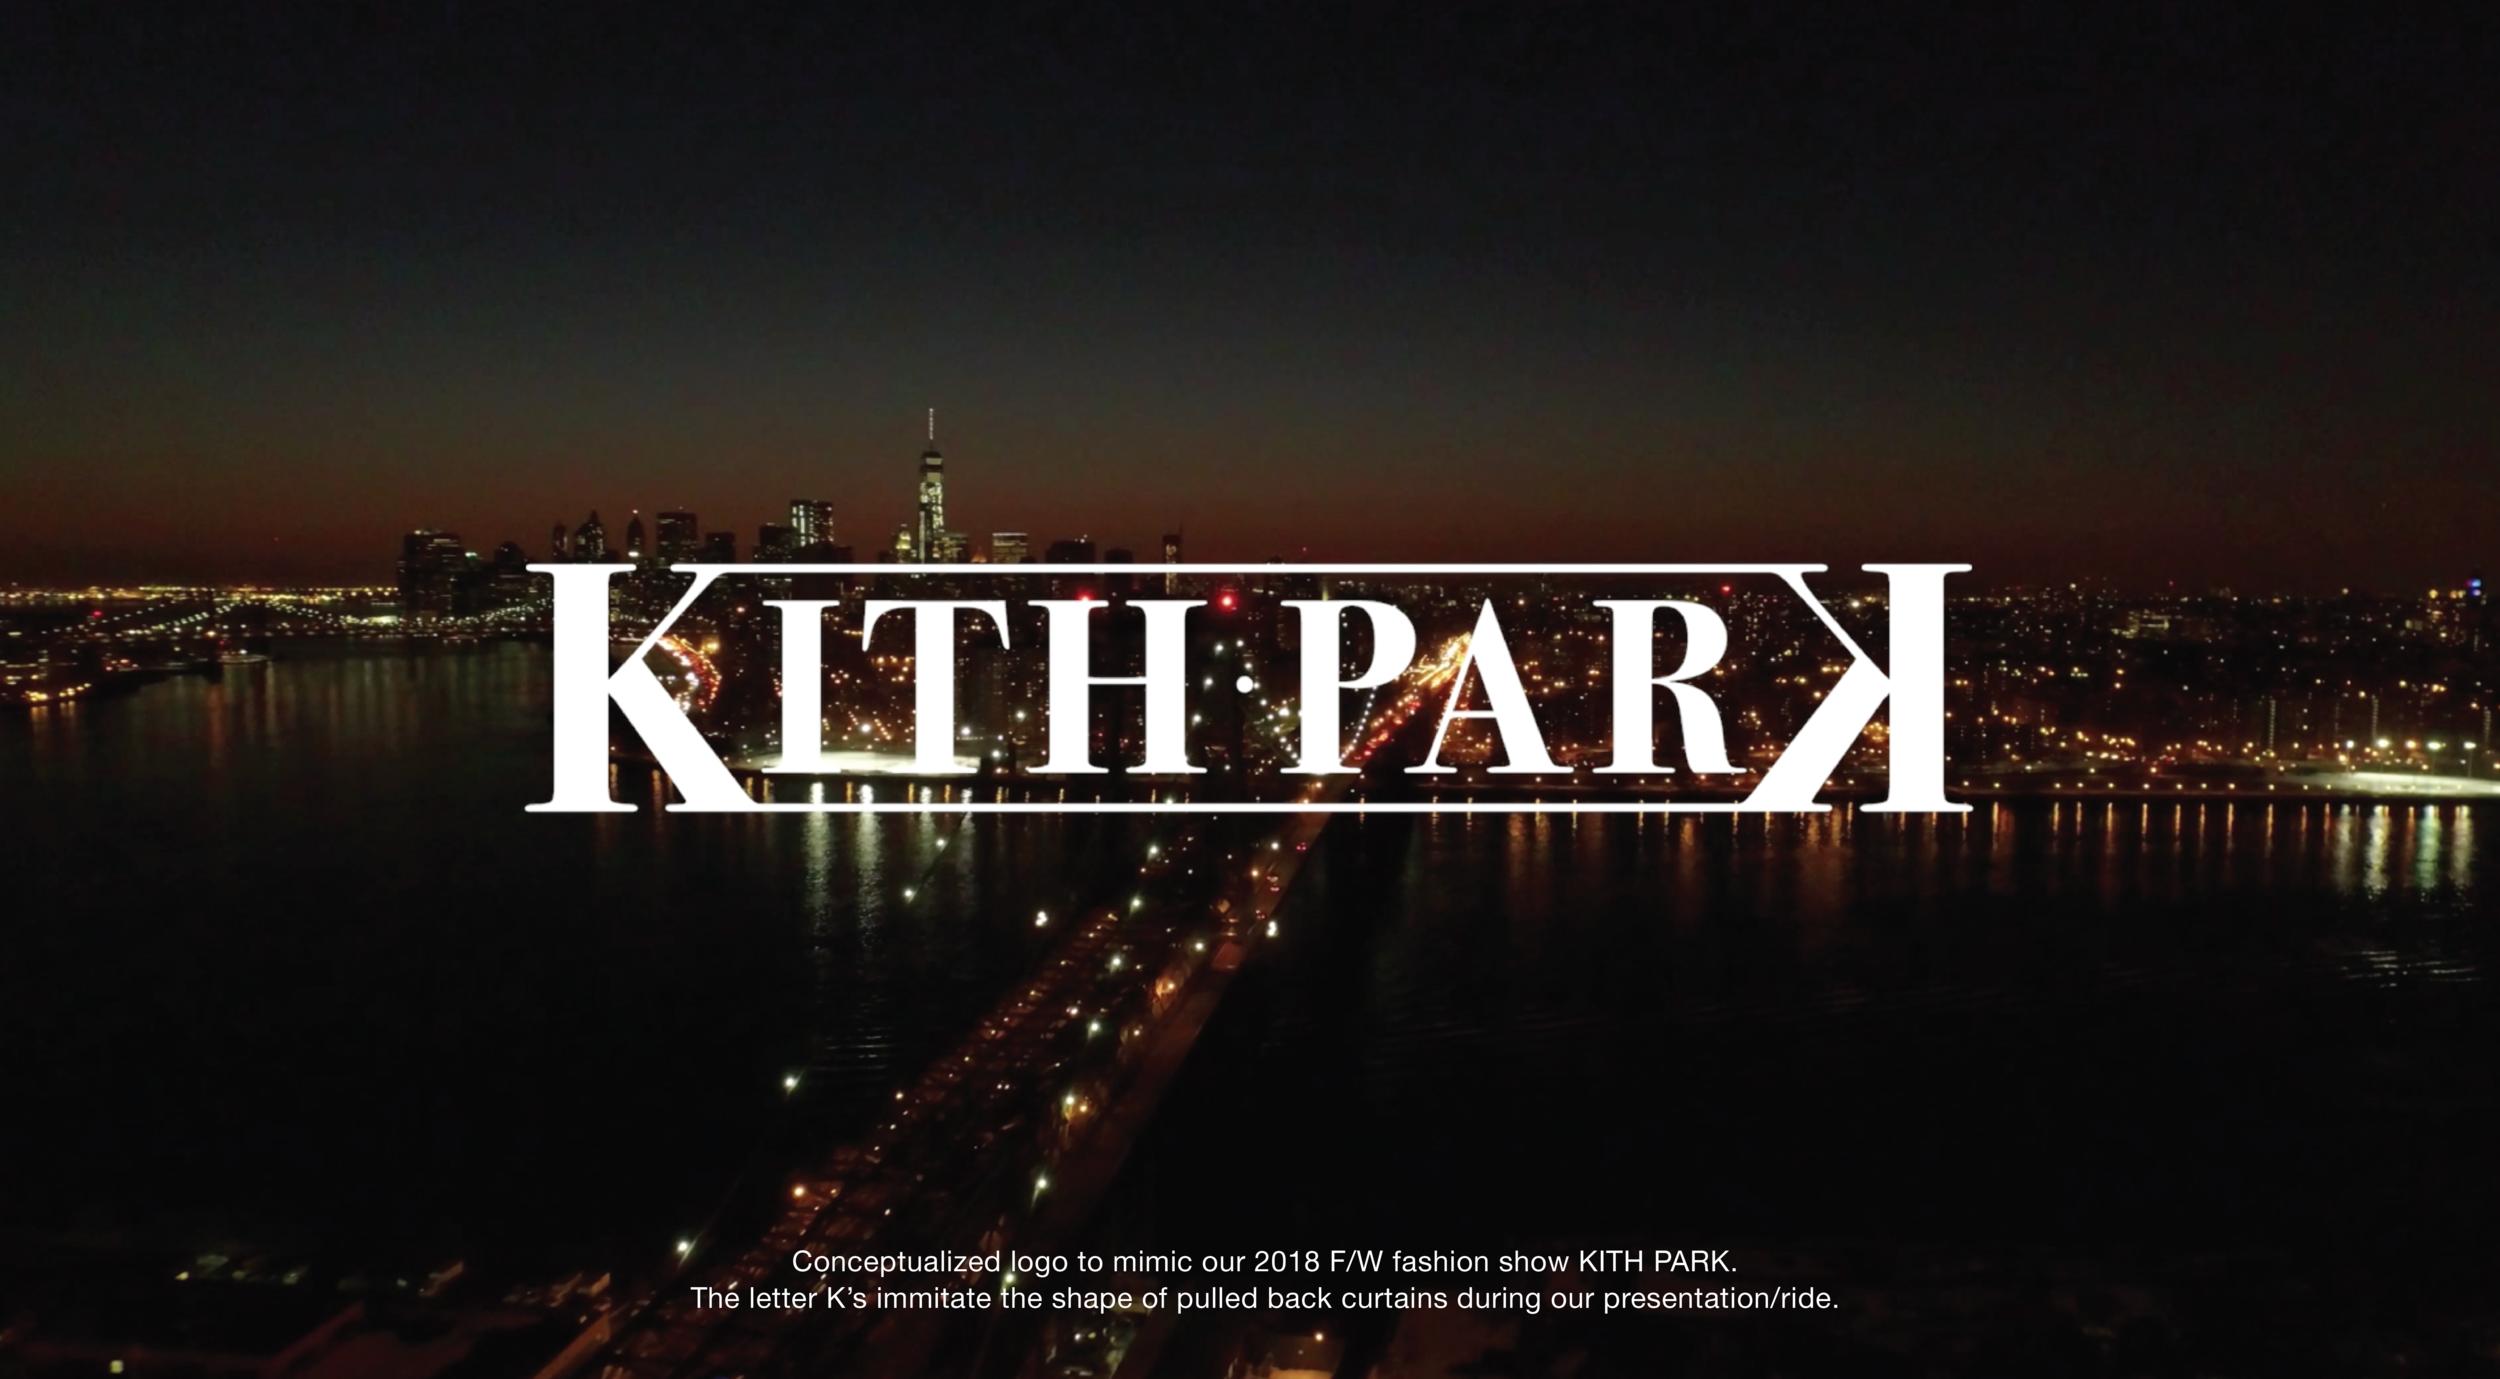 Kithpark2-01.png